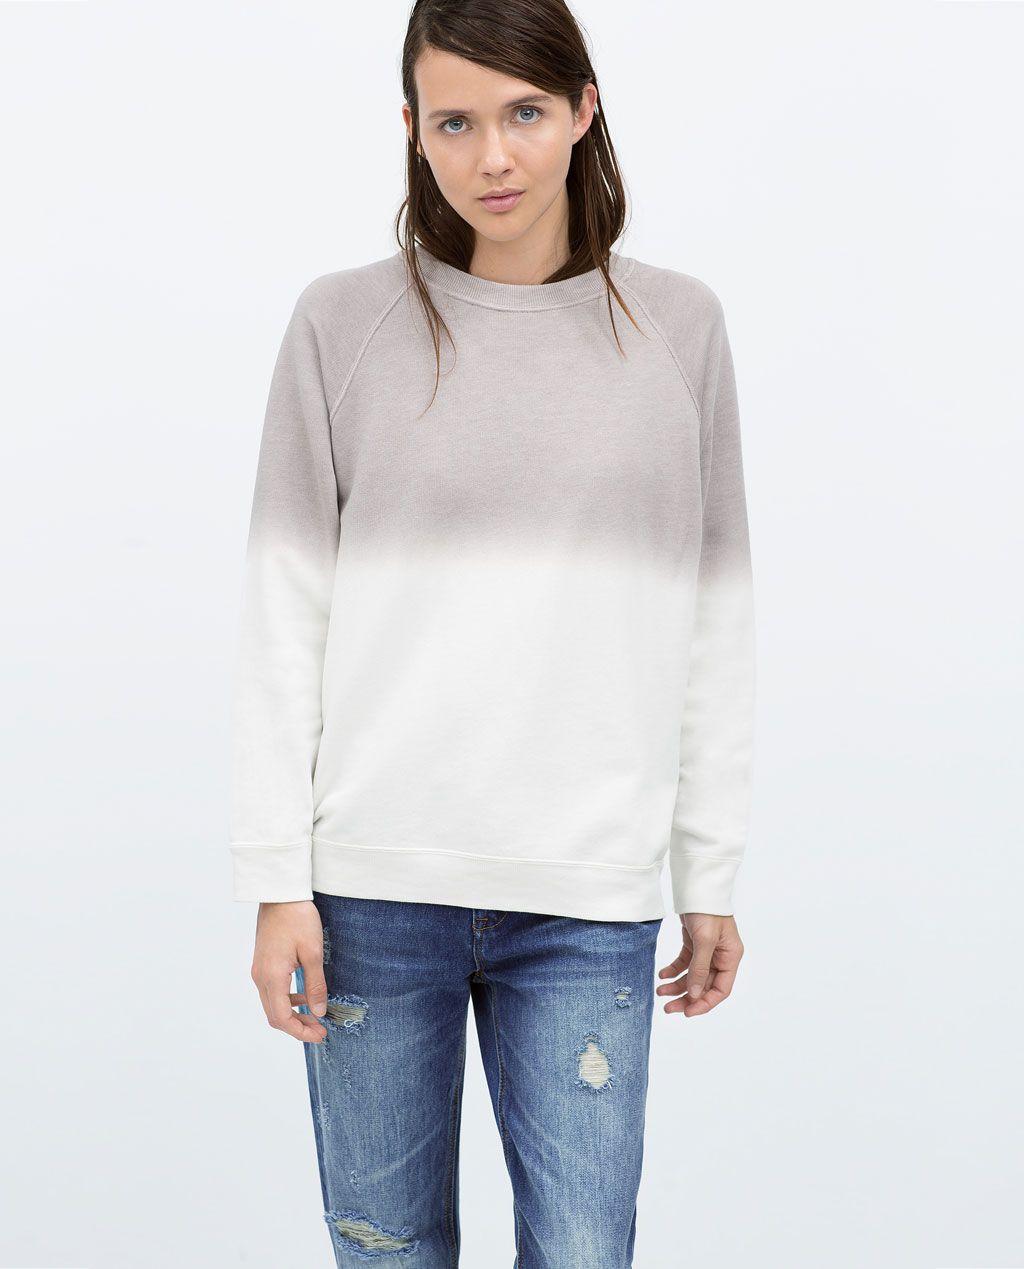 Image 2 of tiedye sweatshirt from zara tie dye sweatshirt